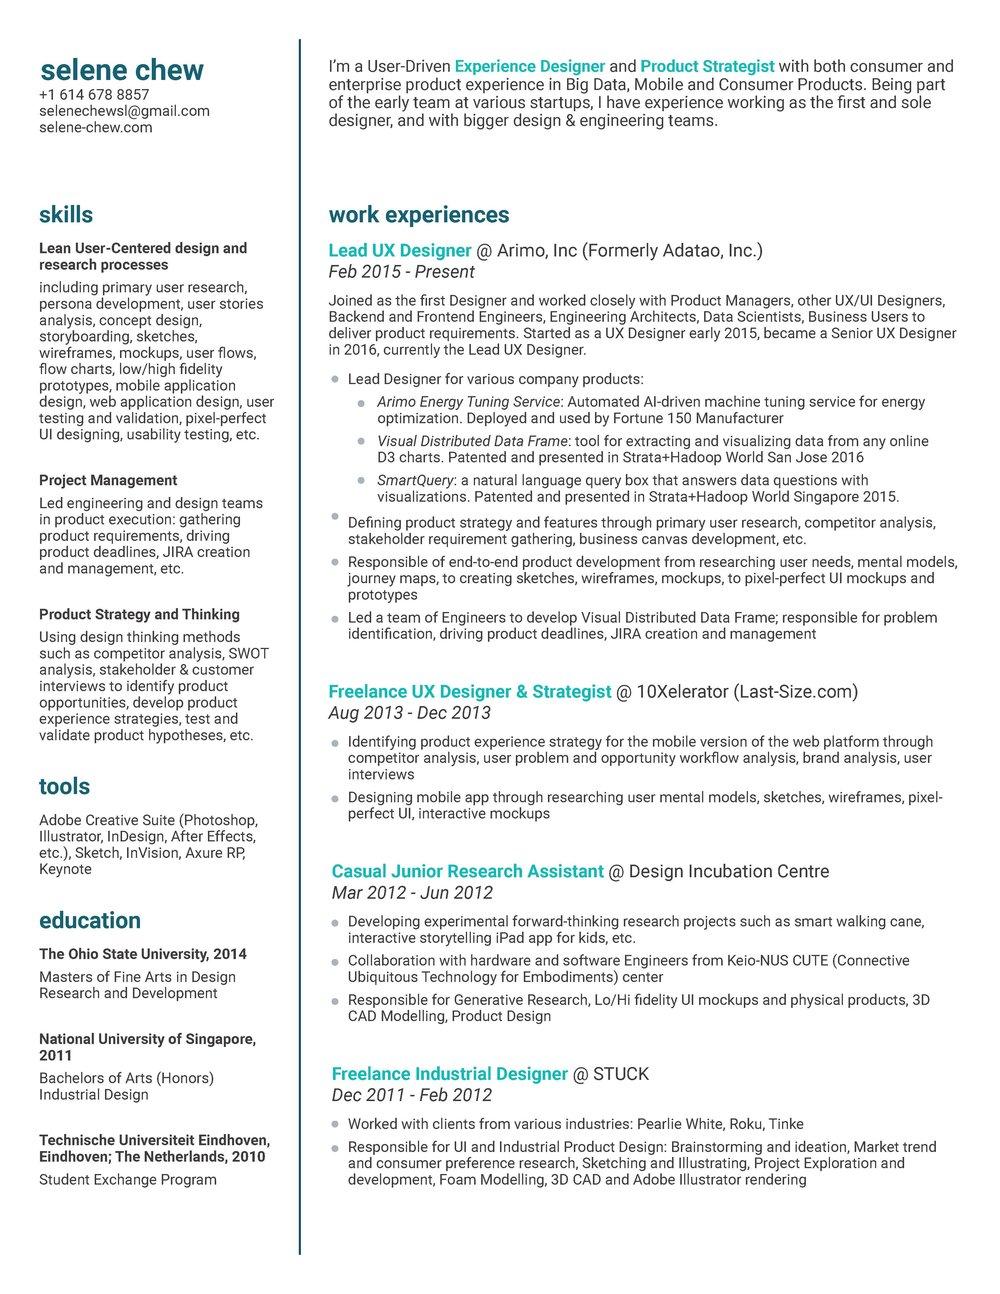 Selene Chew Resume 2017_Page_1.jpg